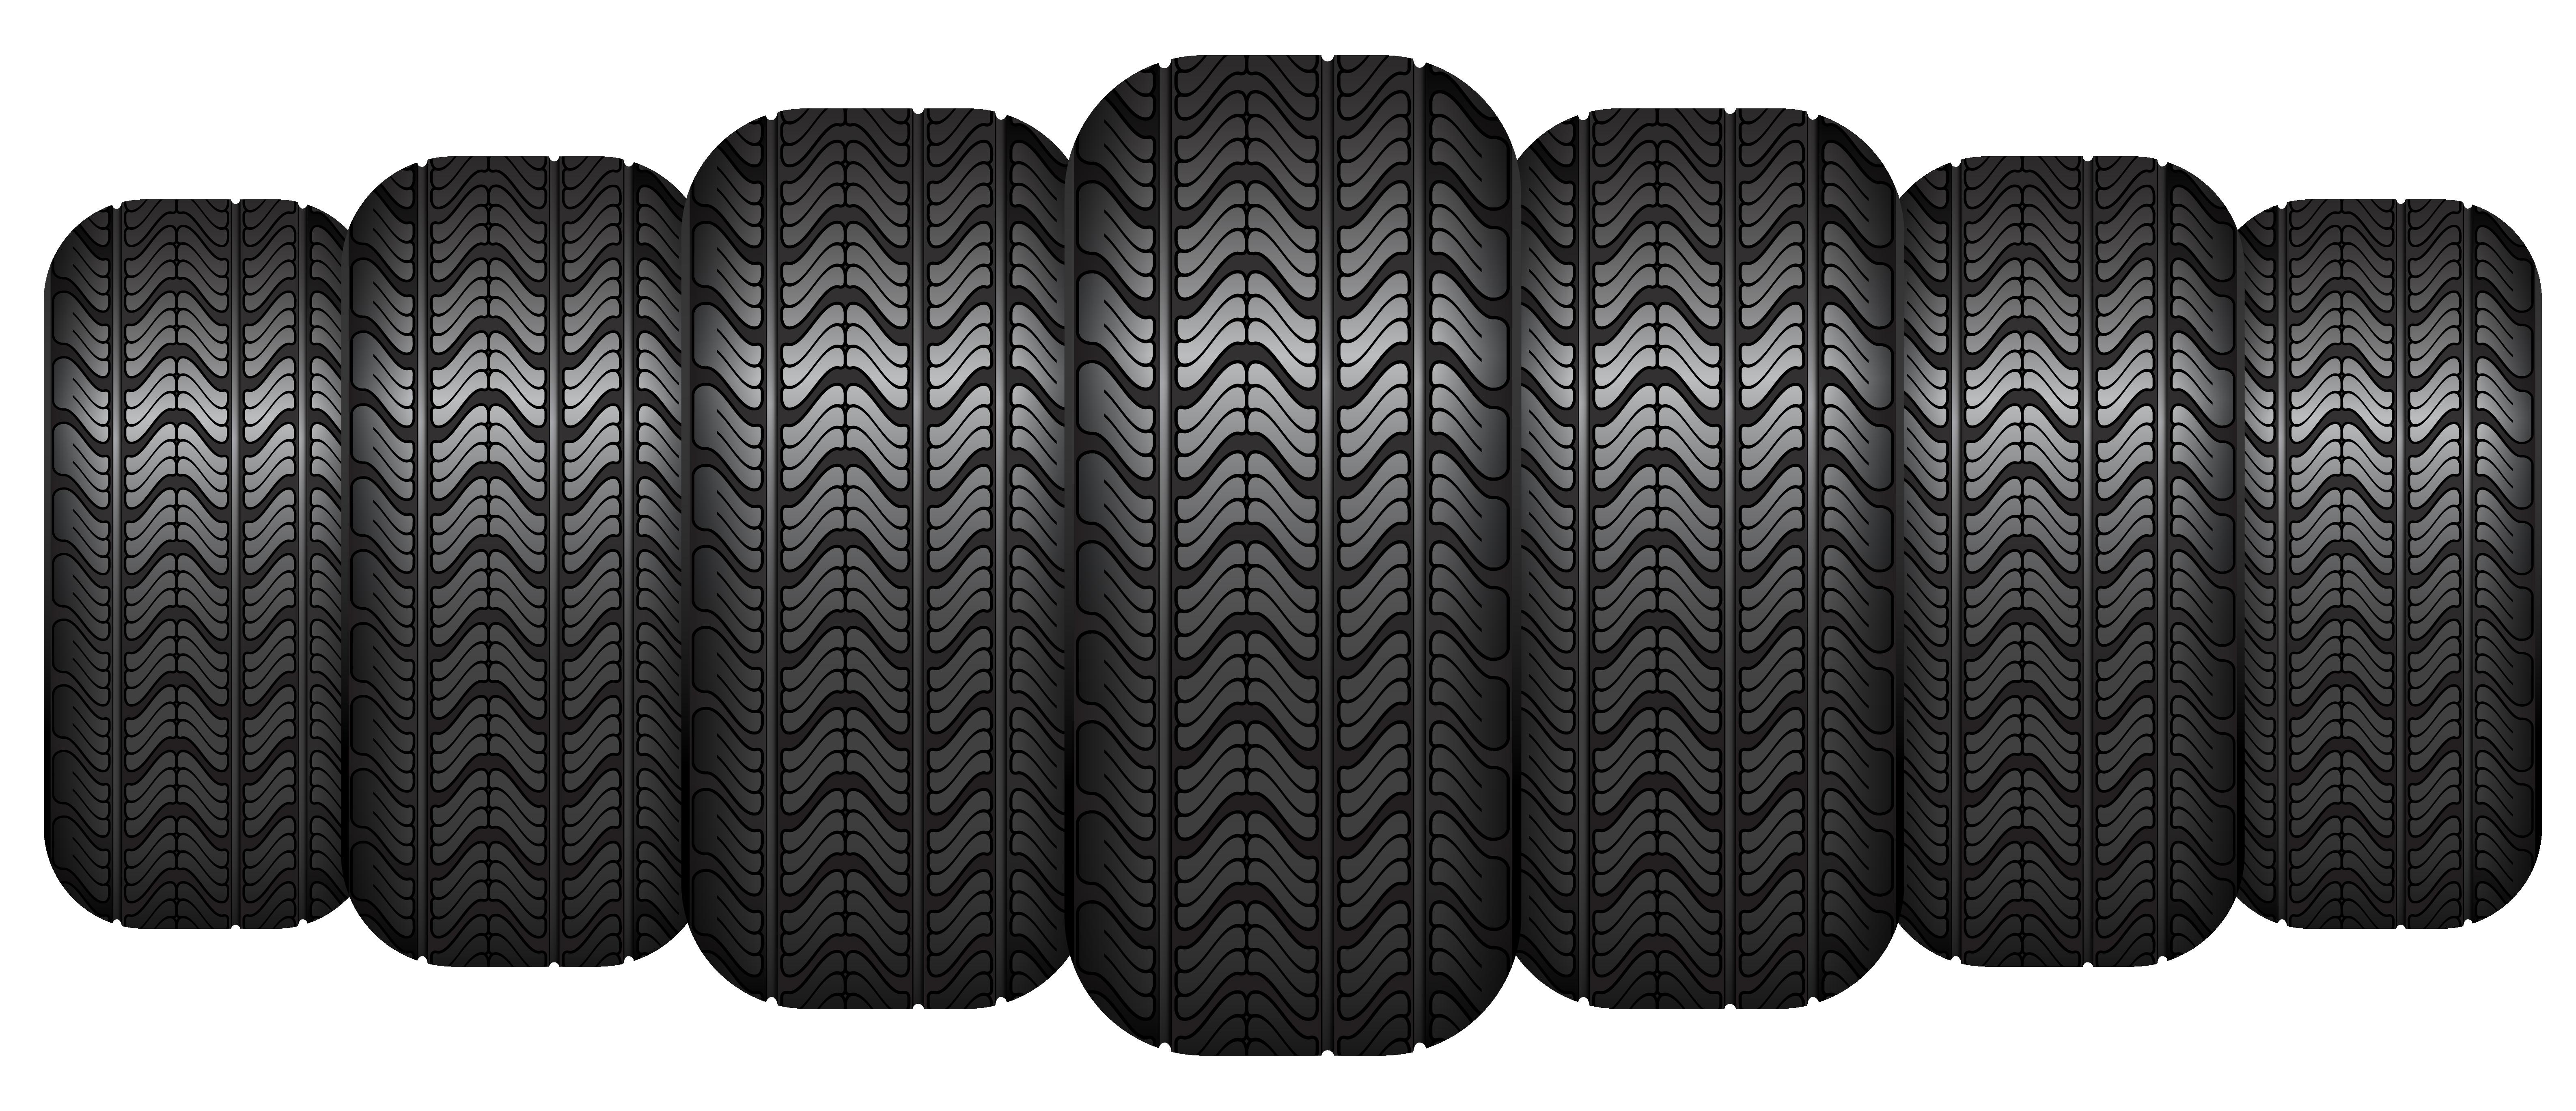 svg transparent stock Car png best web. Tires clipart